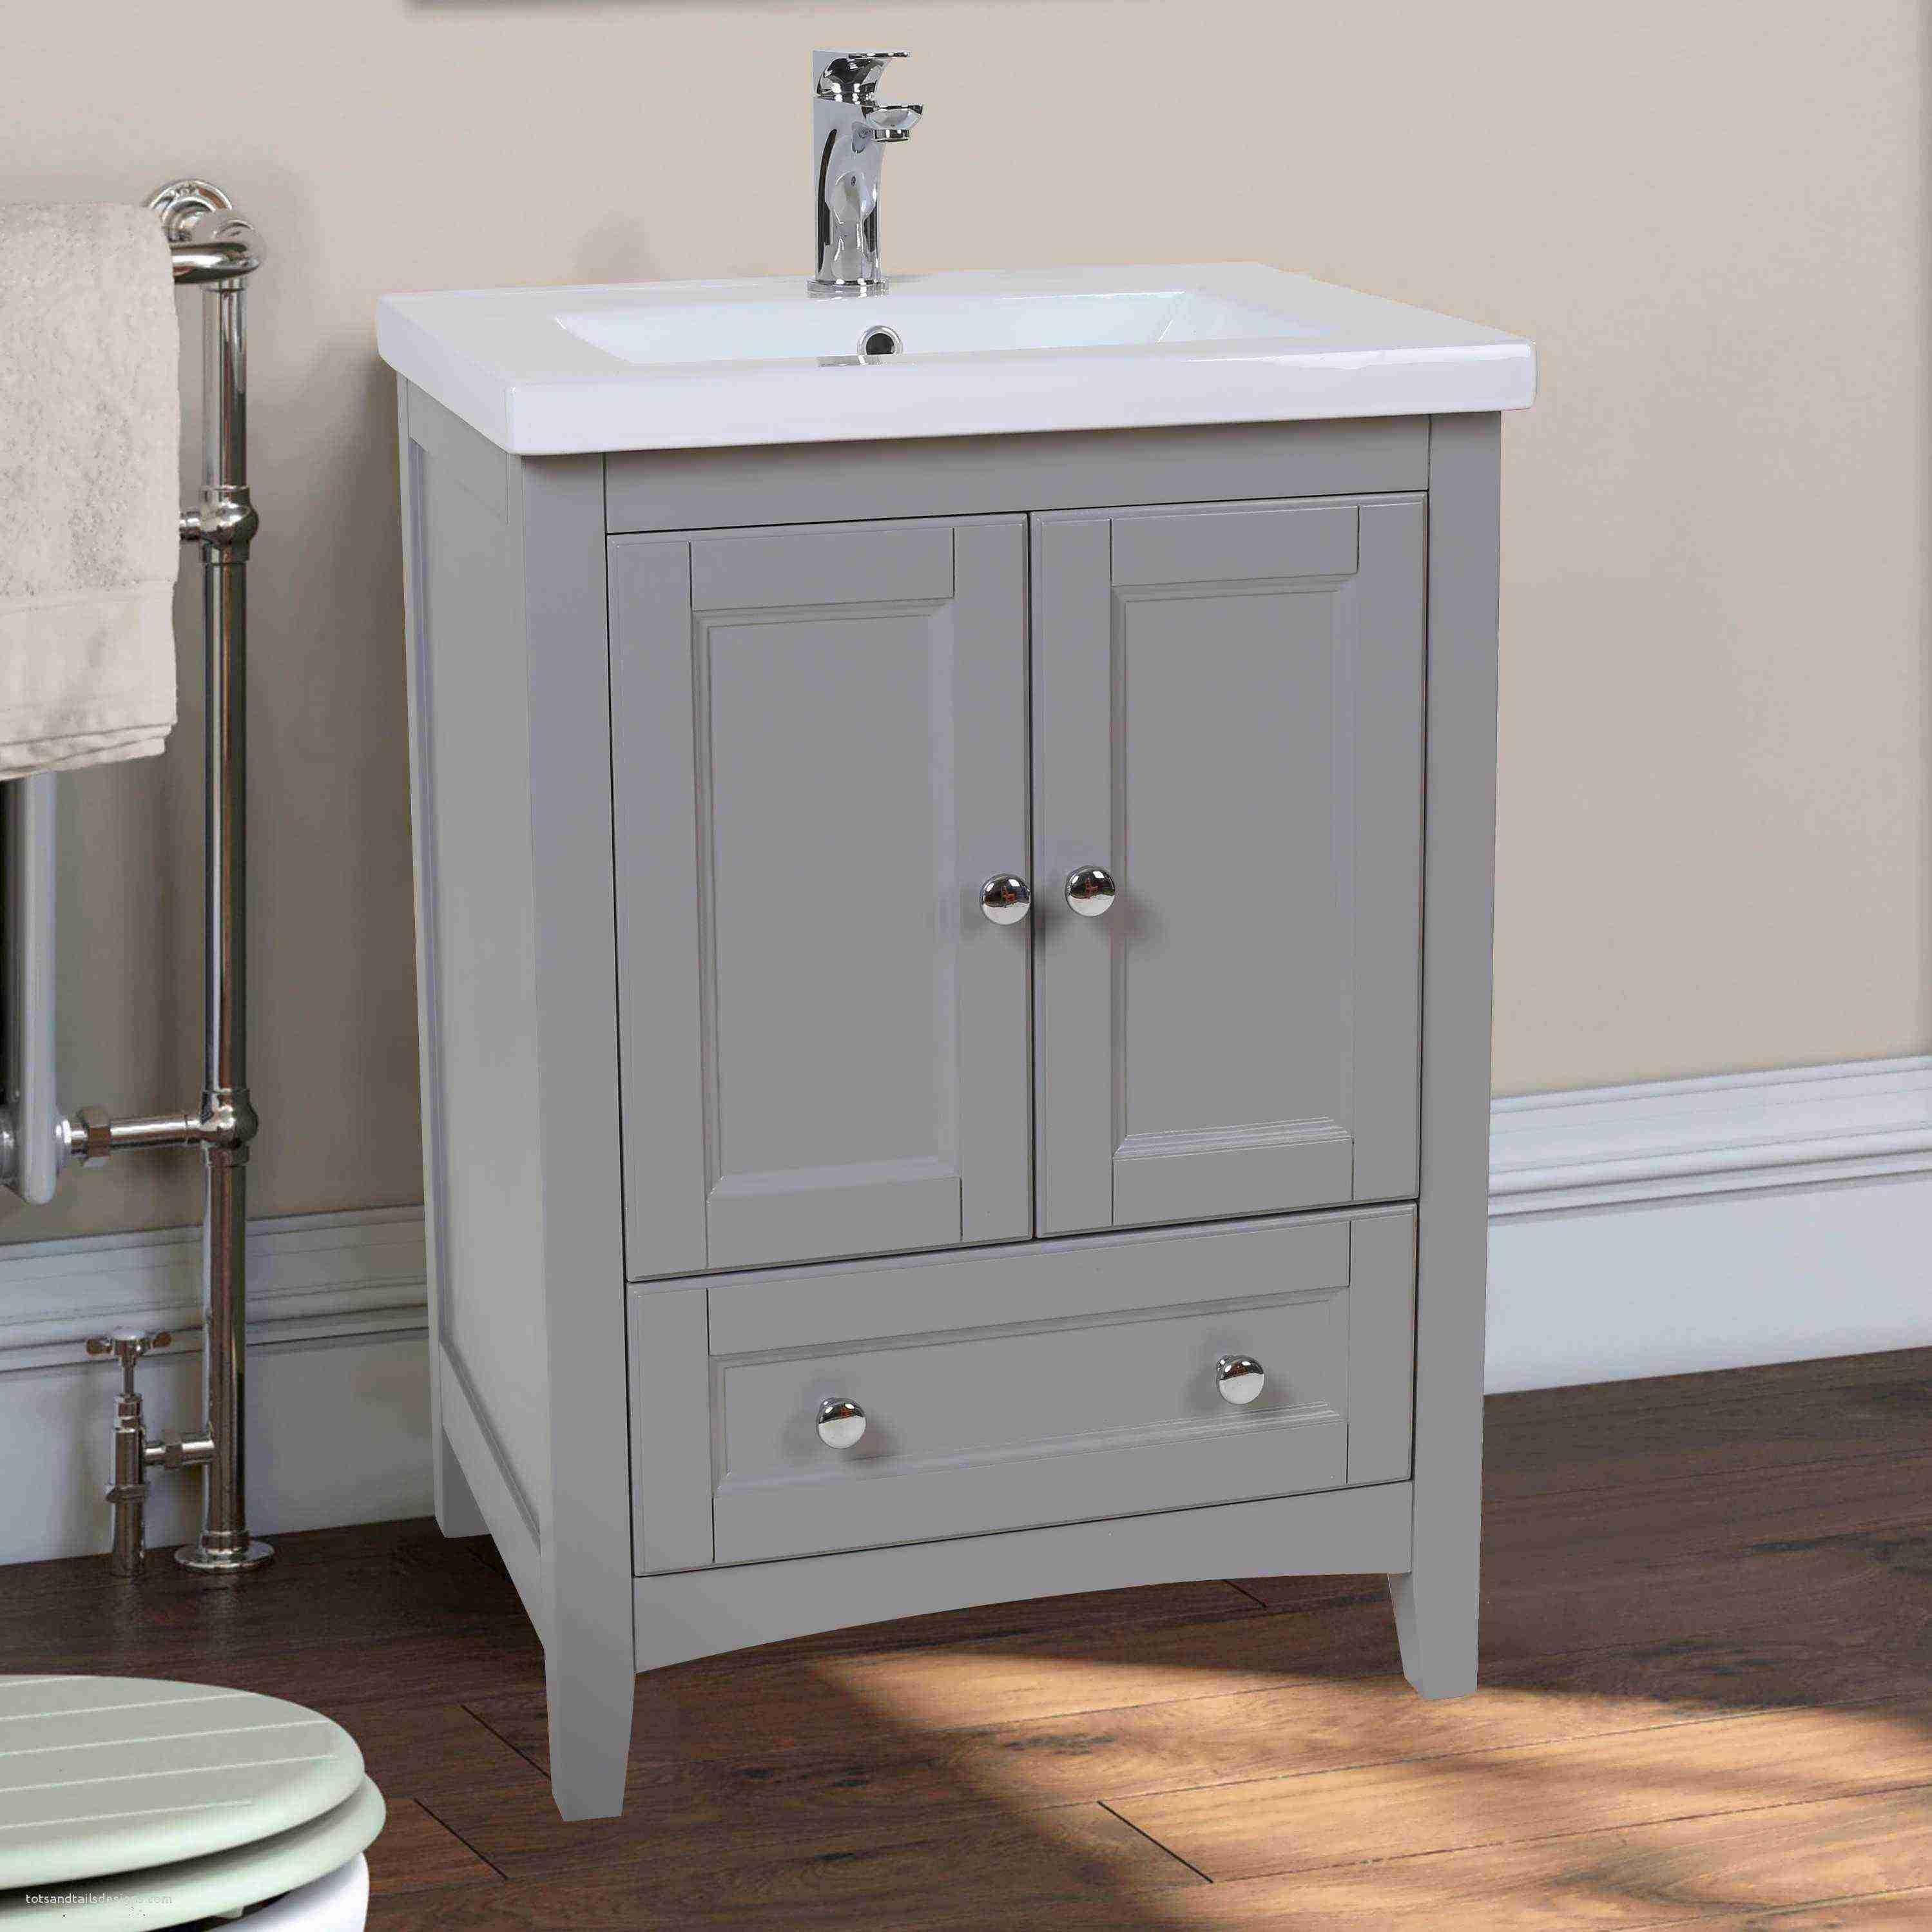 Fromthearmchair Best Of 19 Inch Depth Bathroom Vanity Small Bathroom Vanities Single Bathroom Vanity 24 Inch Bathroom Vanity